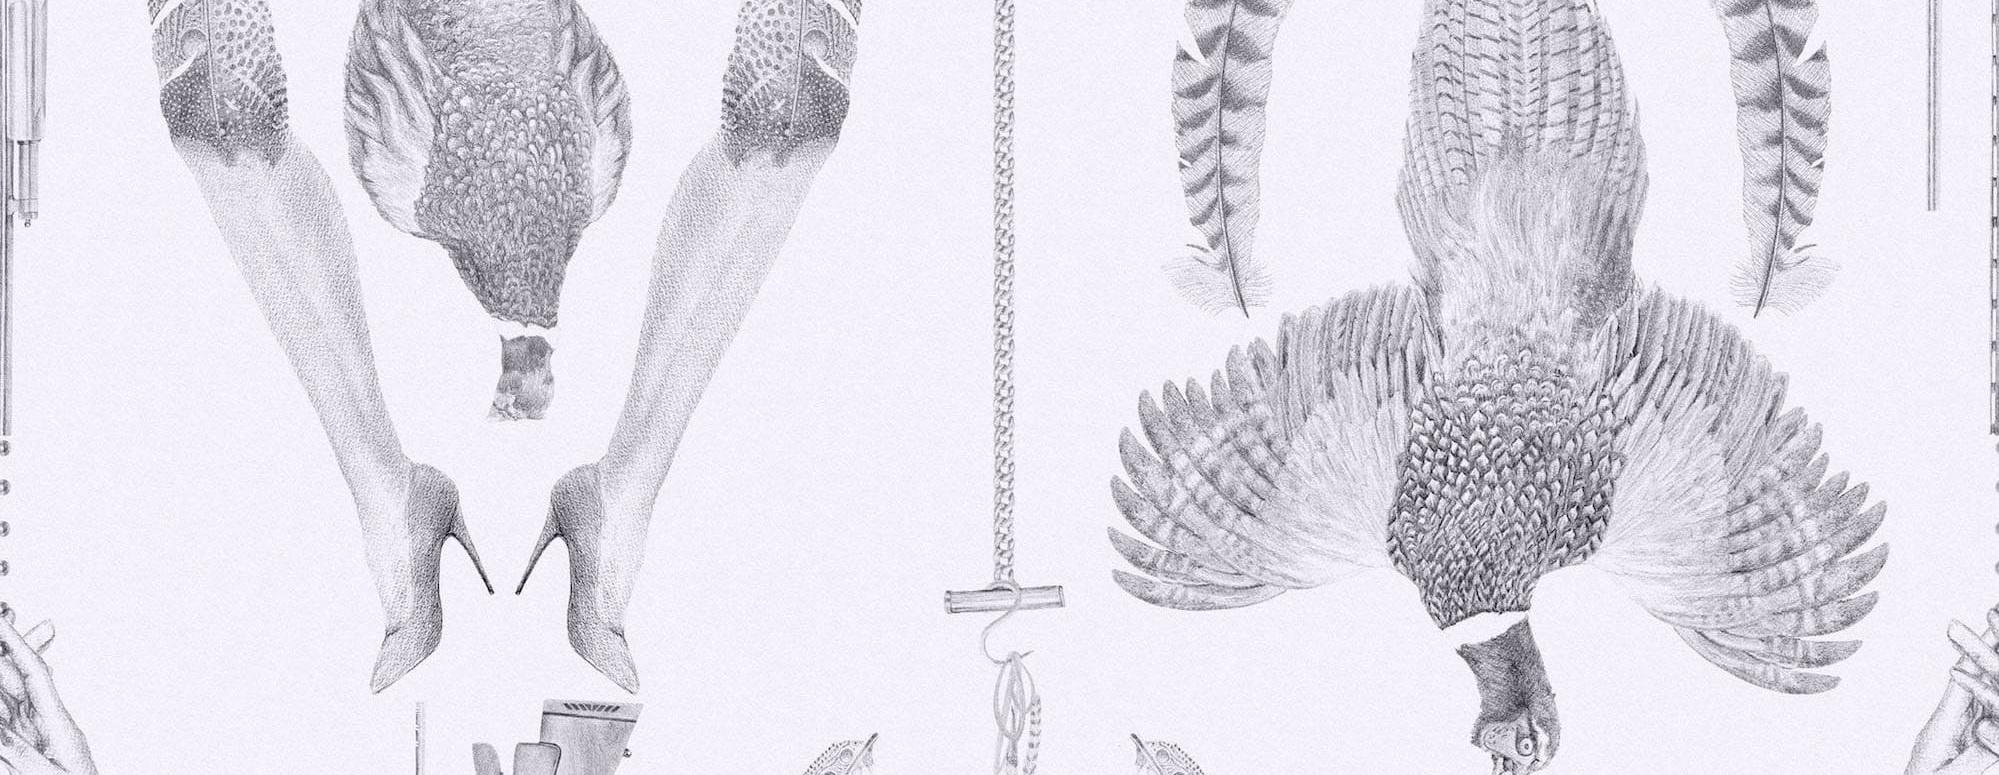 Pheasant-Ammonite-1.jpg